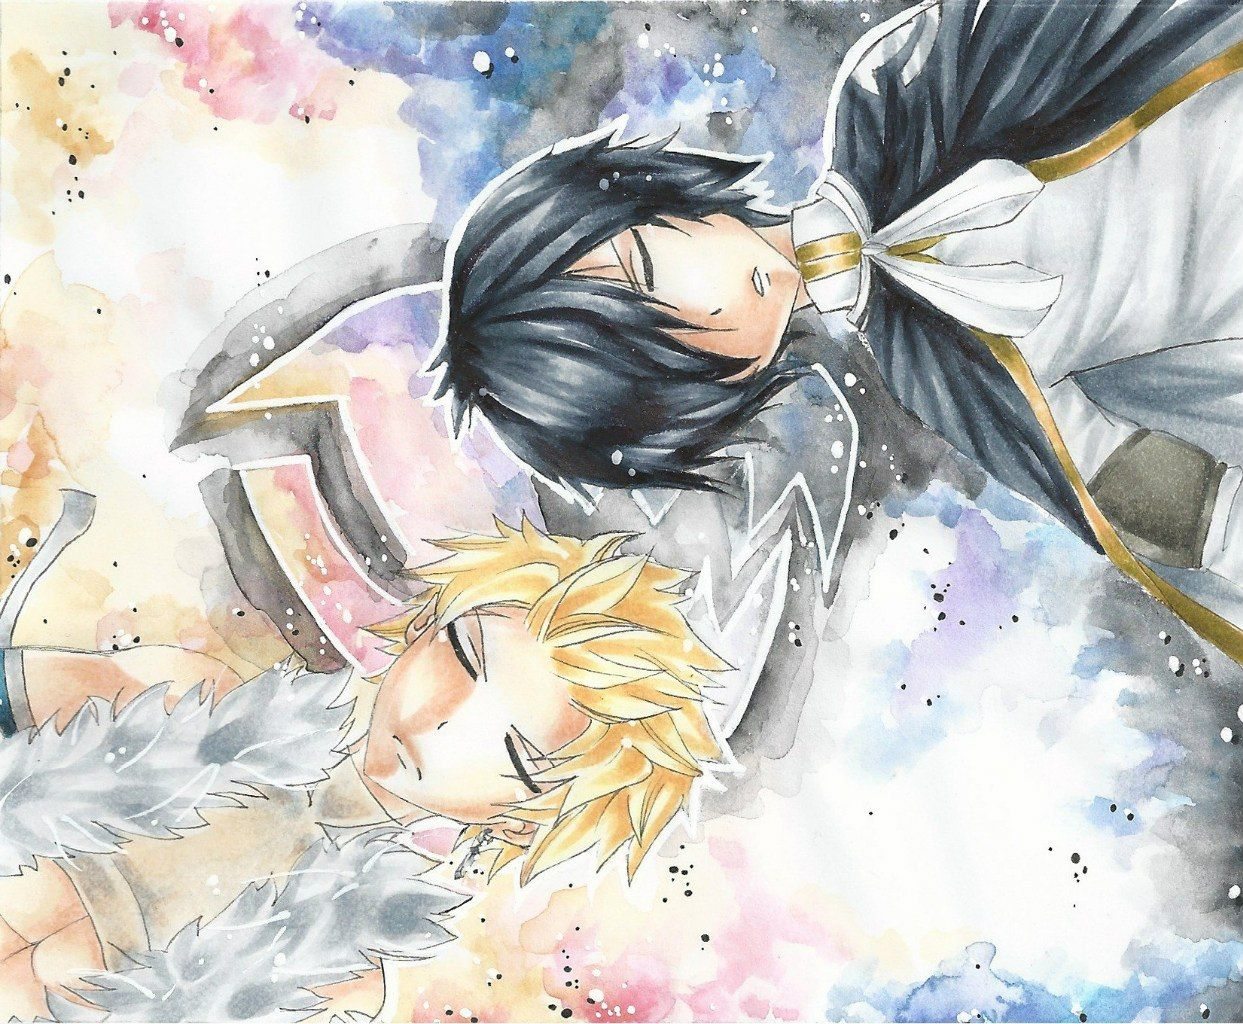 rogue & sting | Anime | Сказки, Фея и Аниме